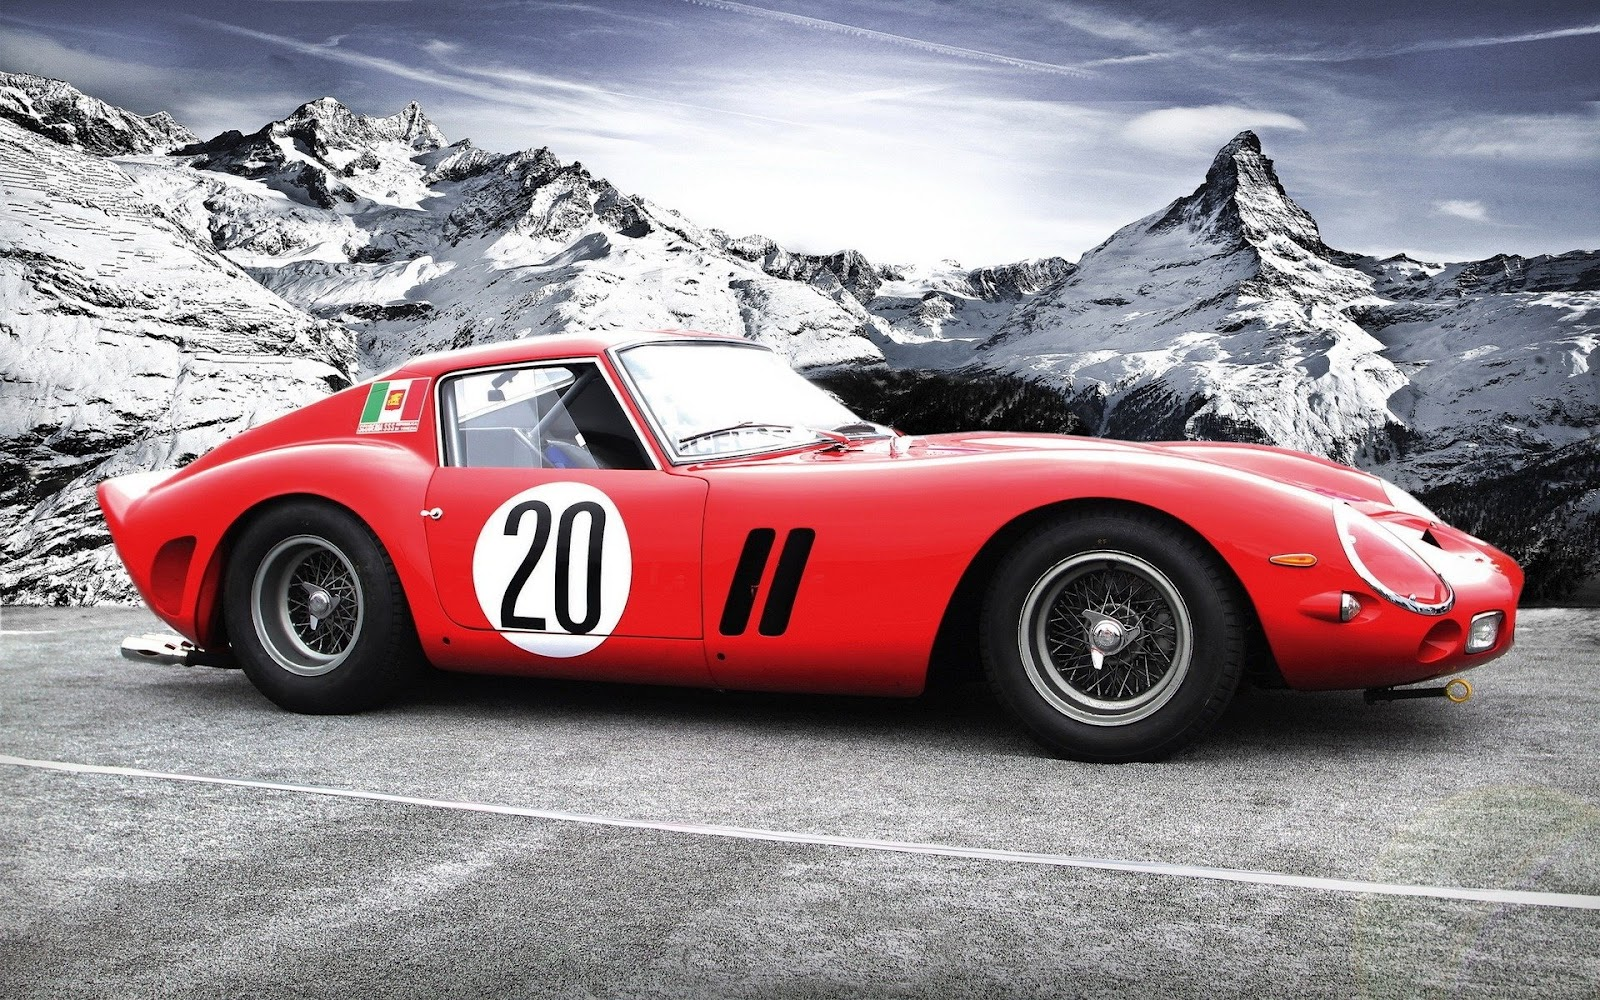 Super Cars History Of Ferrari 0 60 Mph